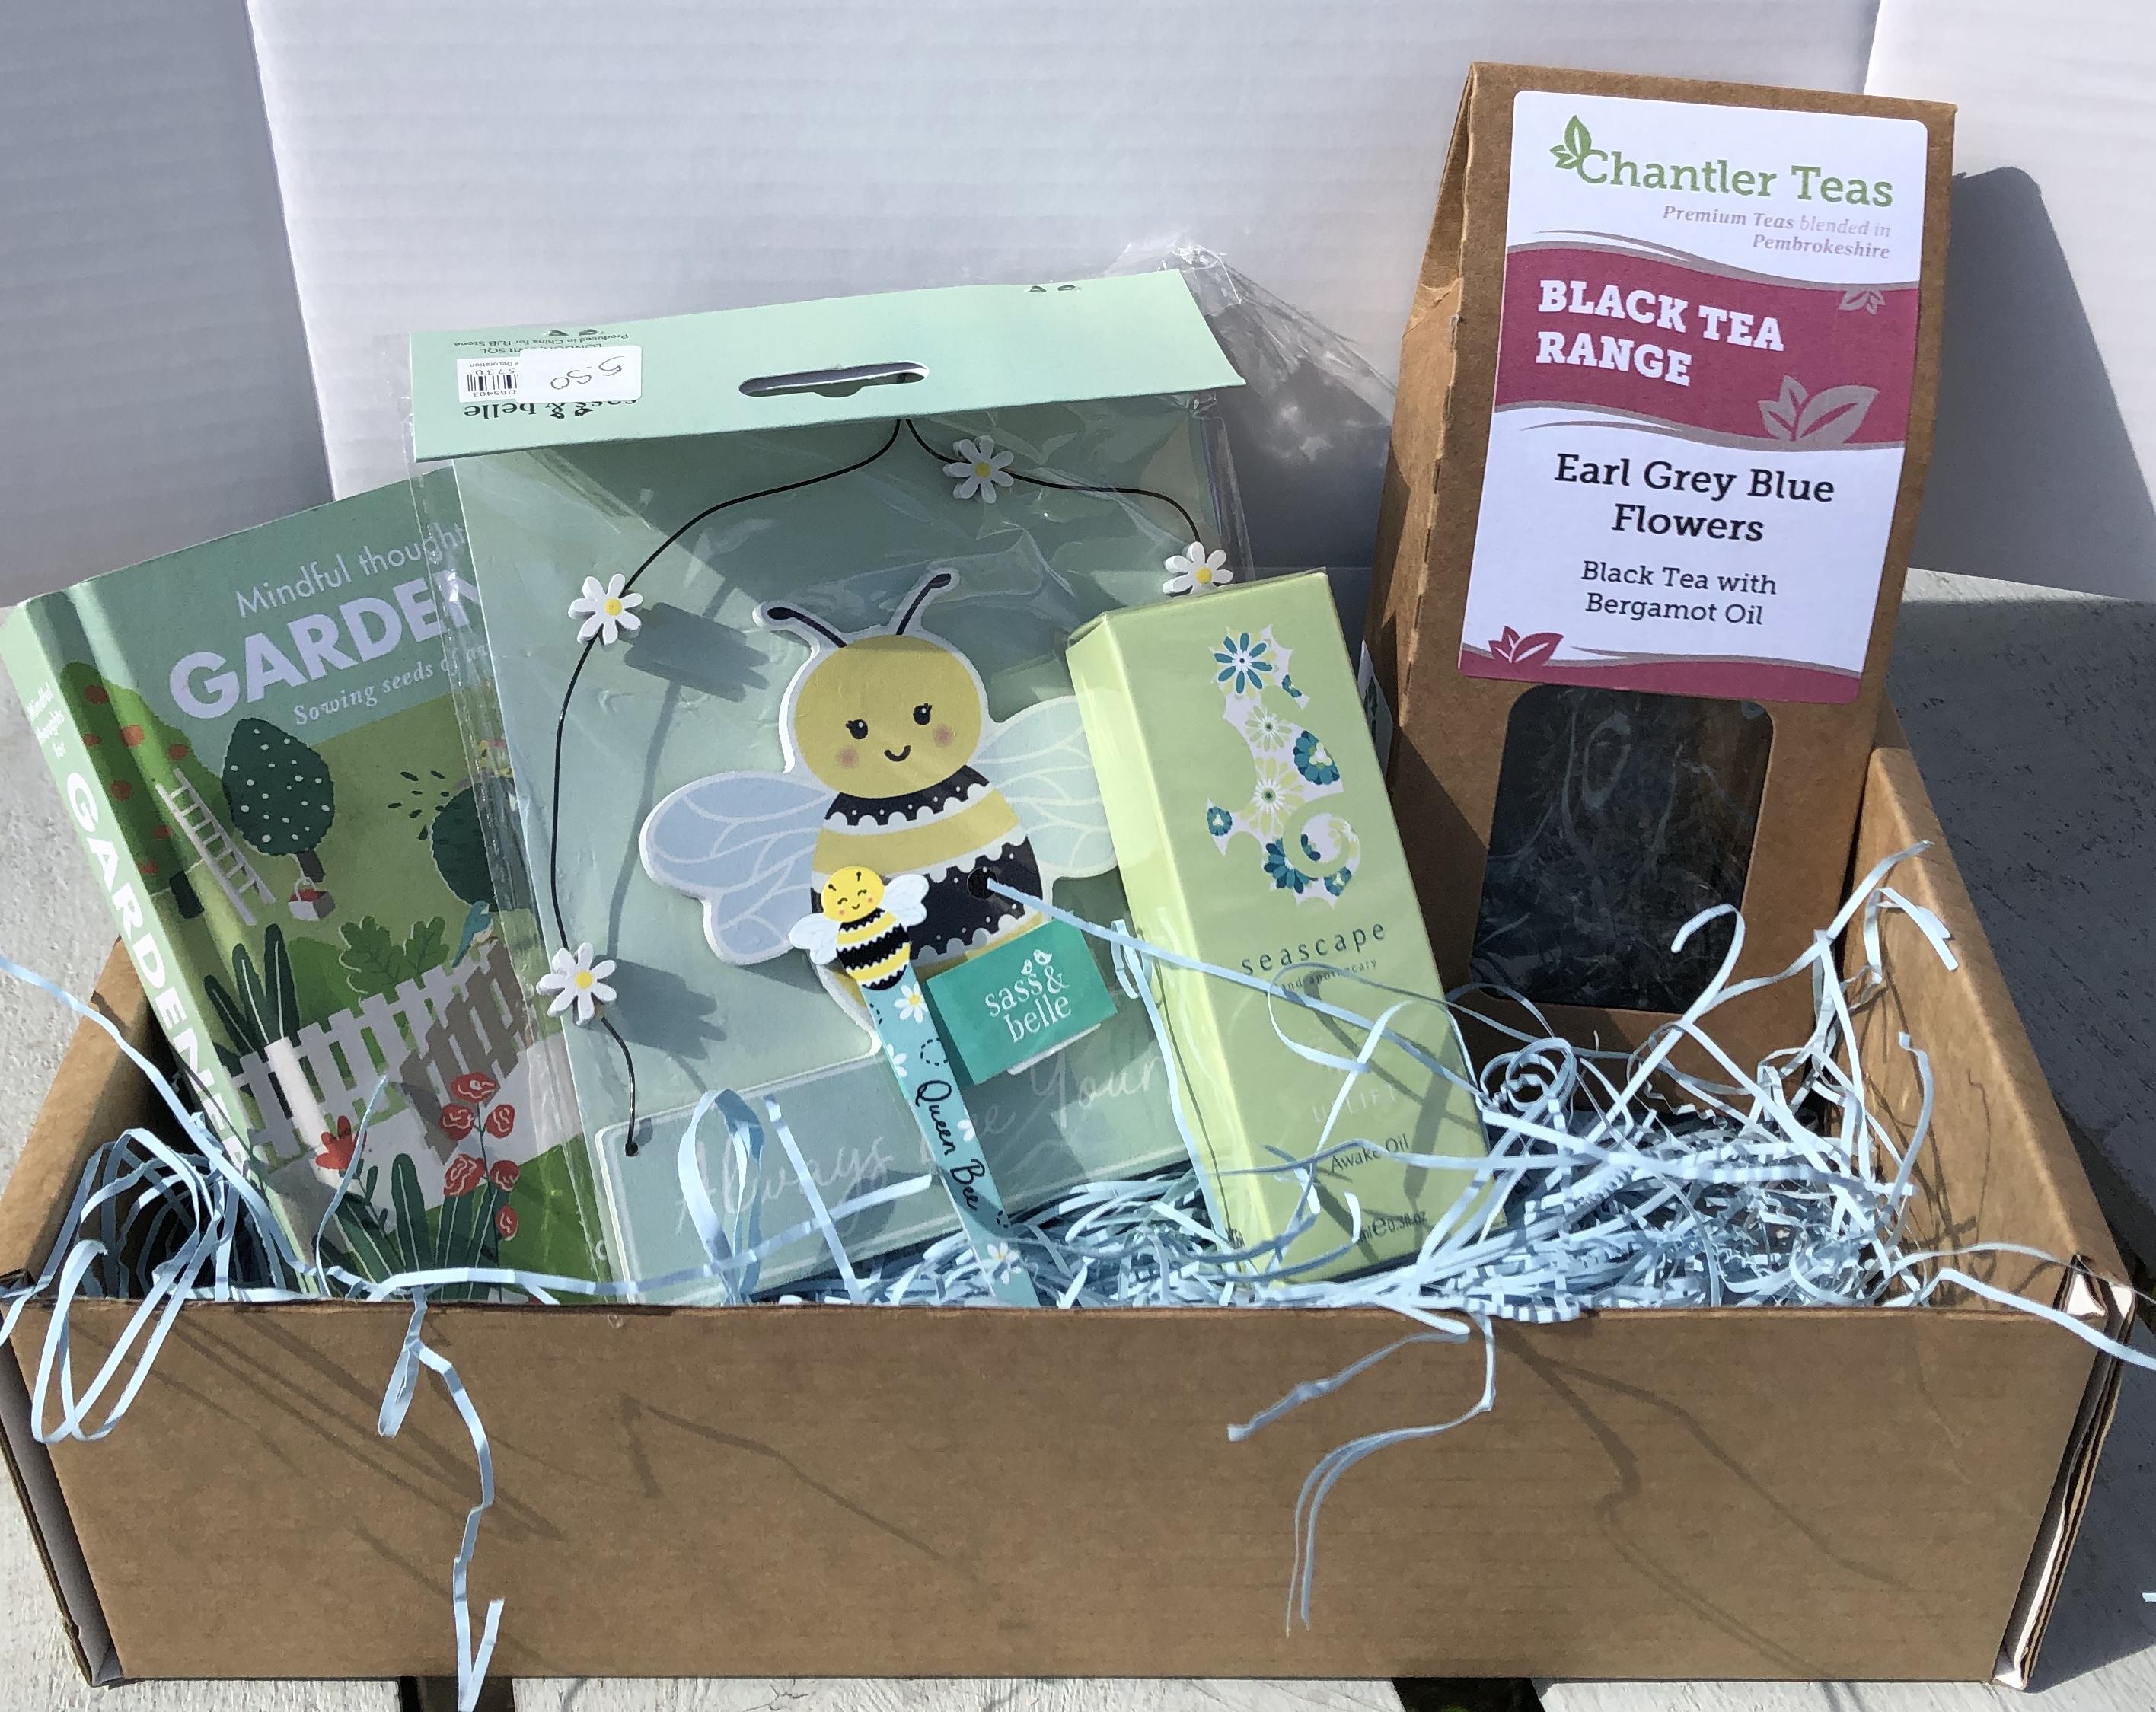 Gardener's Box